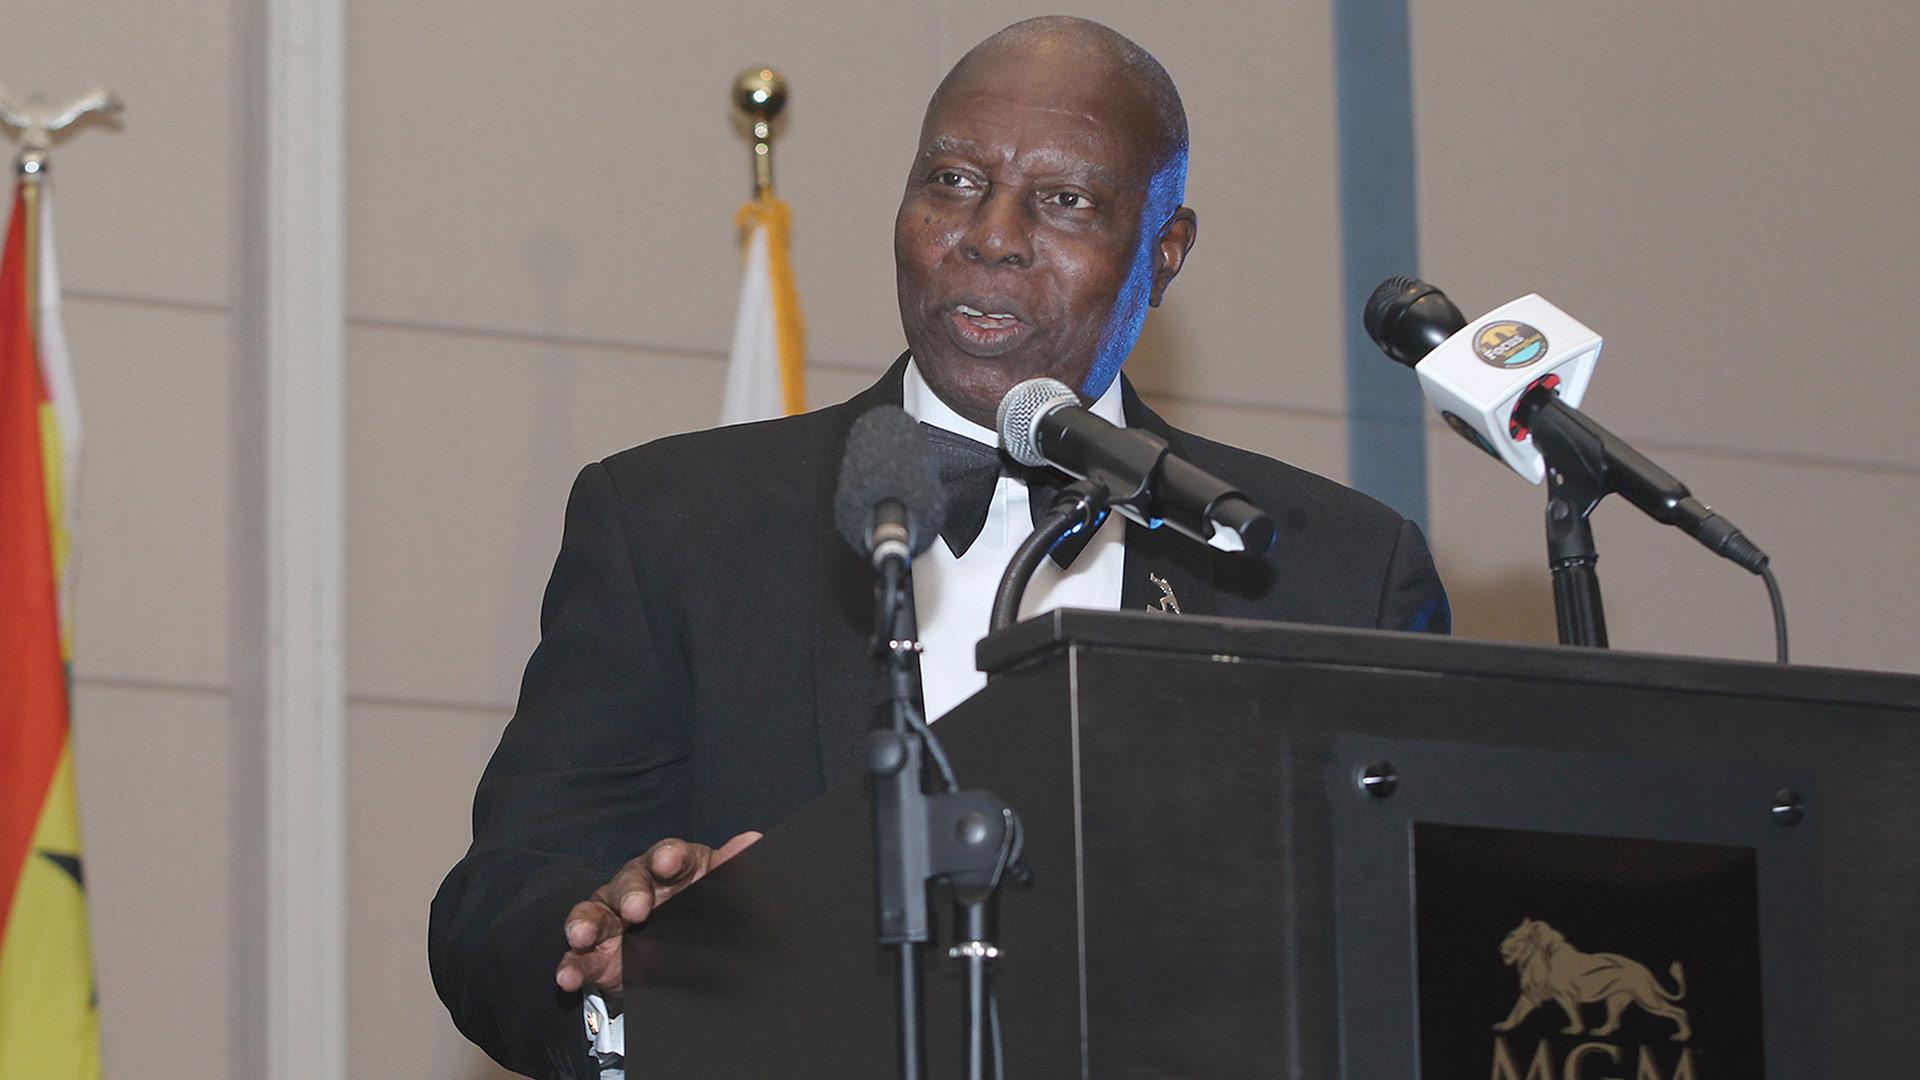 Adjei-Barwuah addresses the crowd